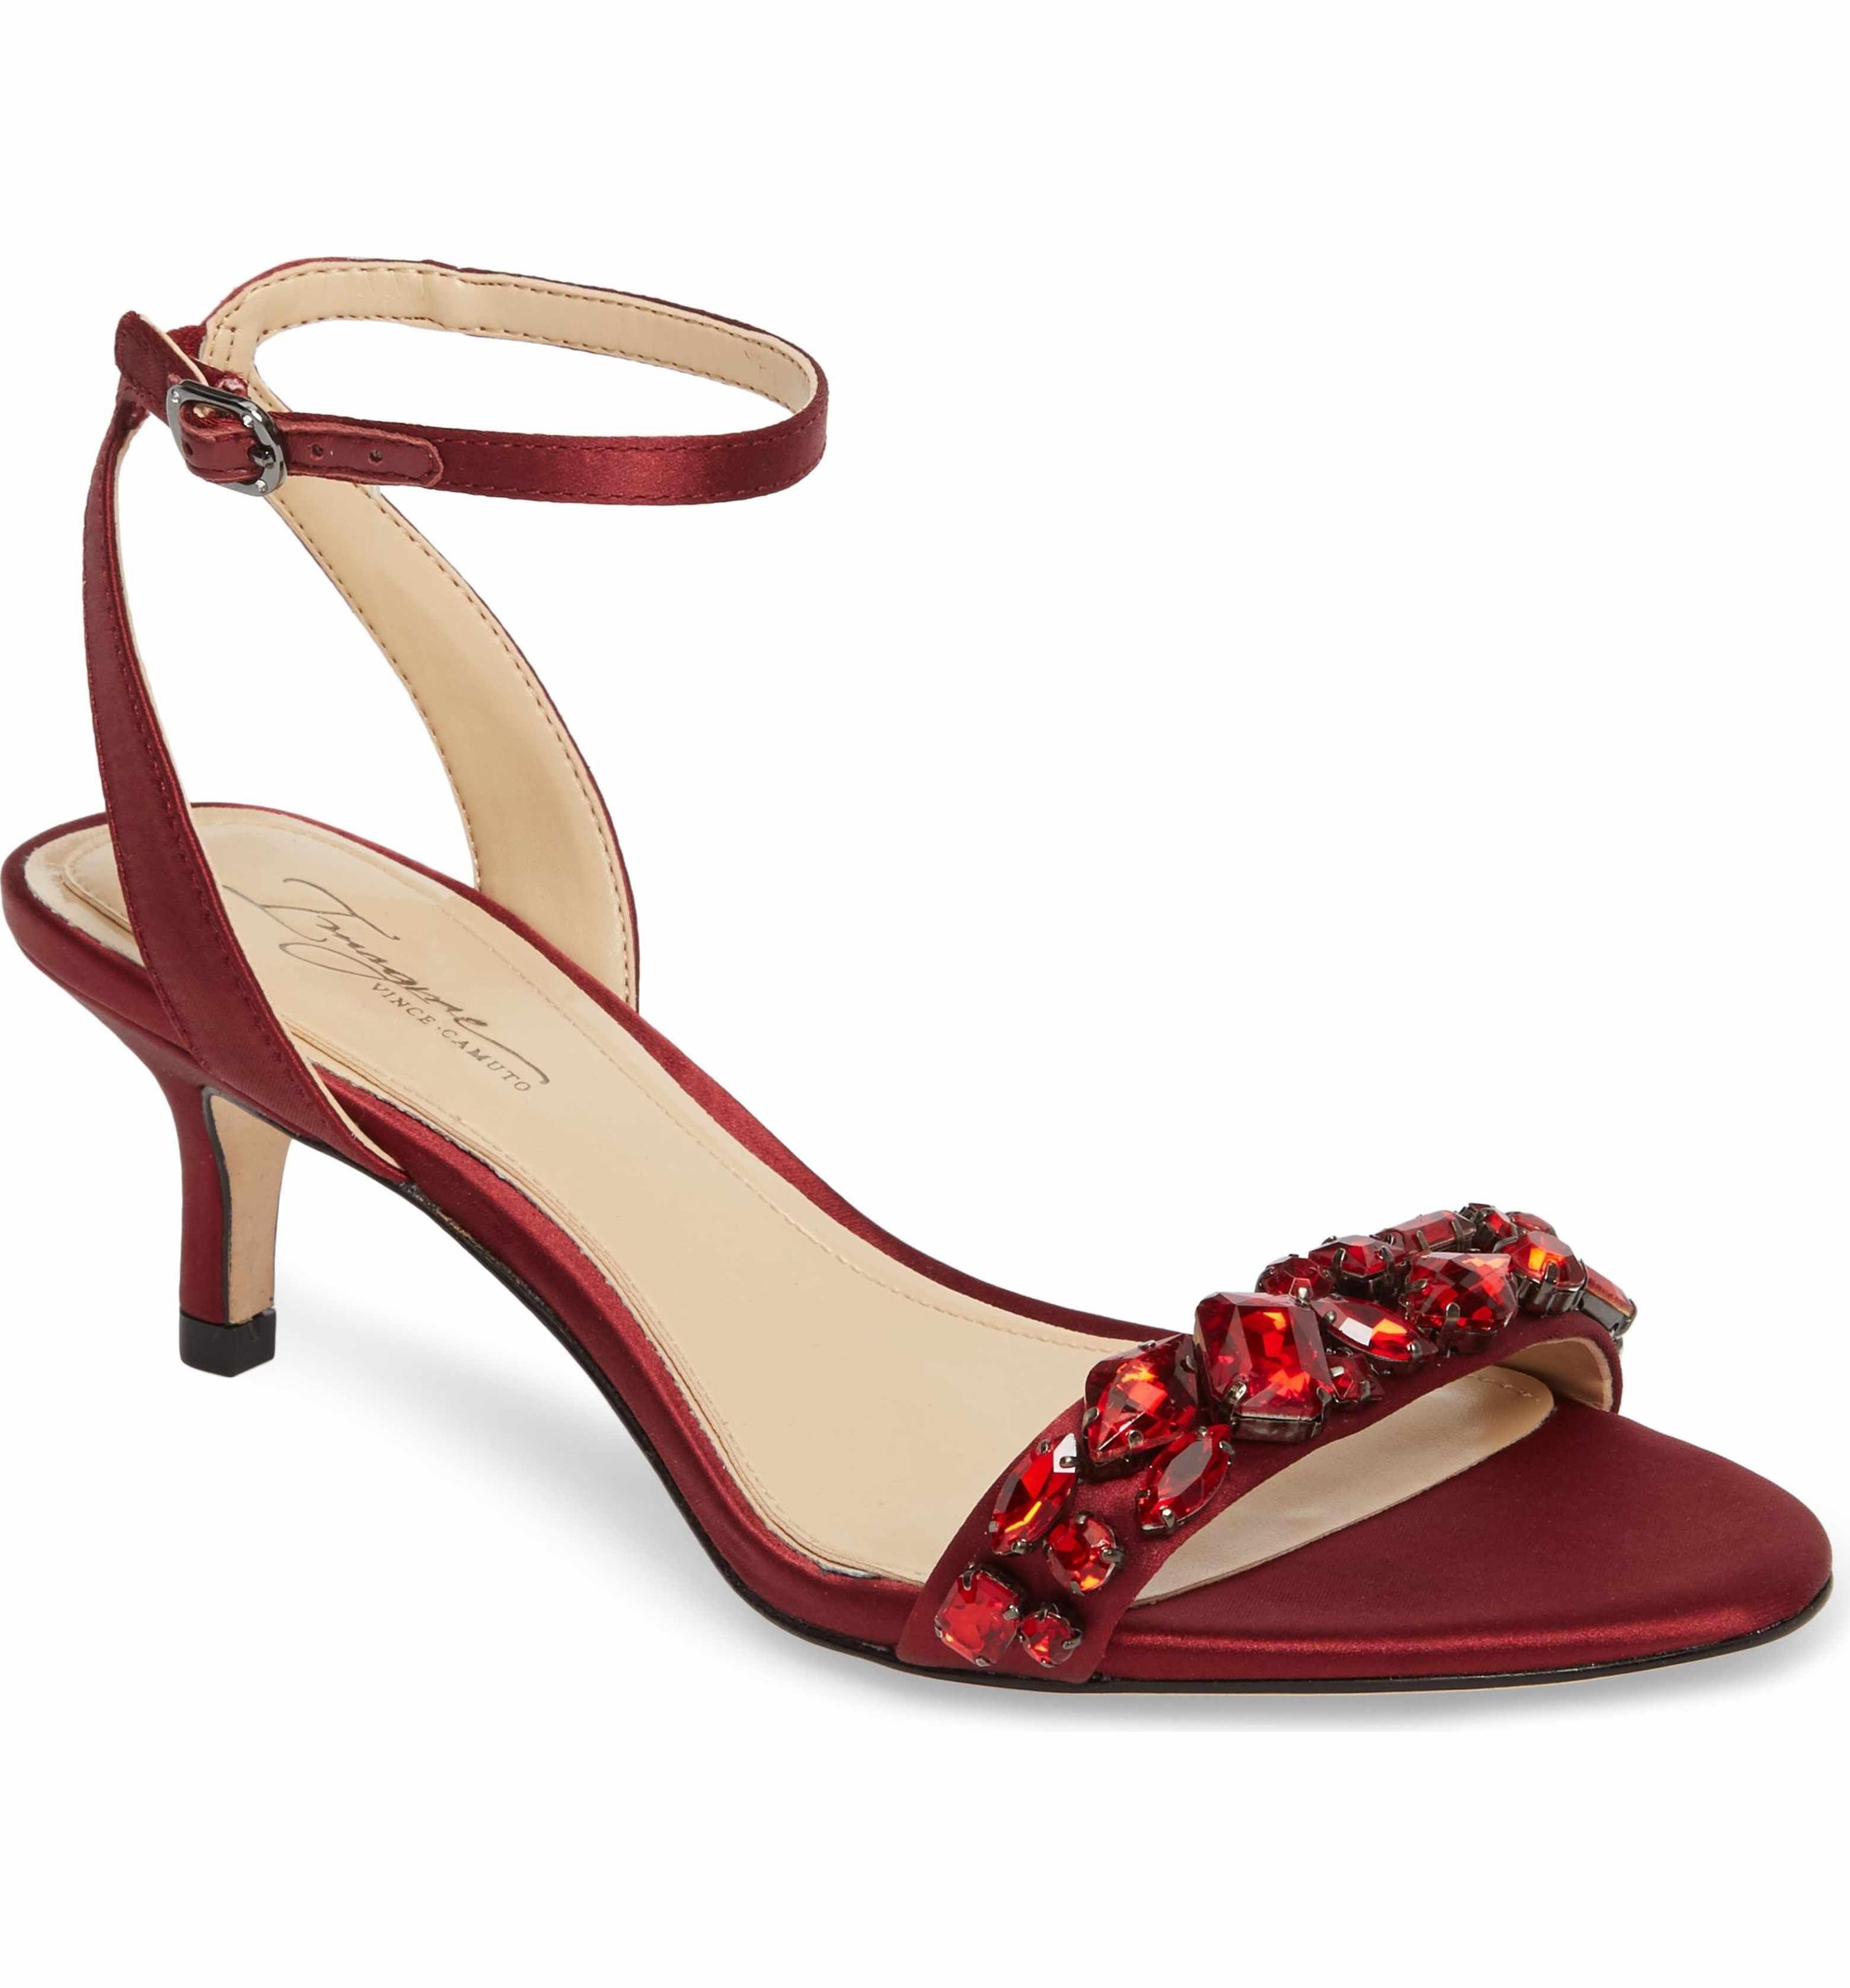 Vince Camuto Women's Imagine Vince Camuto Kolo Embellished Kitten Heel Sandal B4qCf19LZH